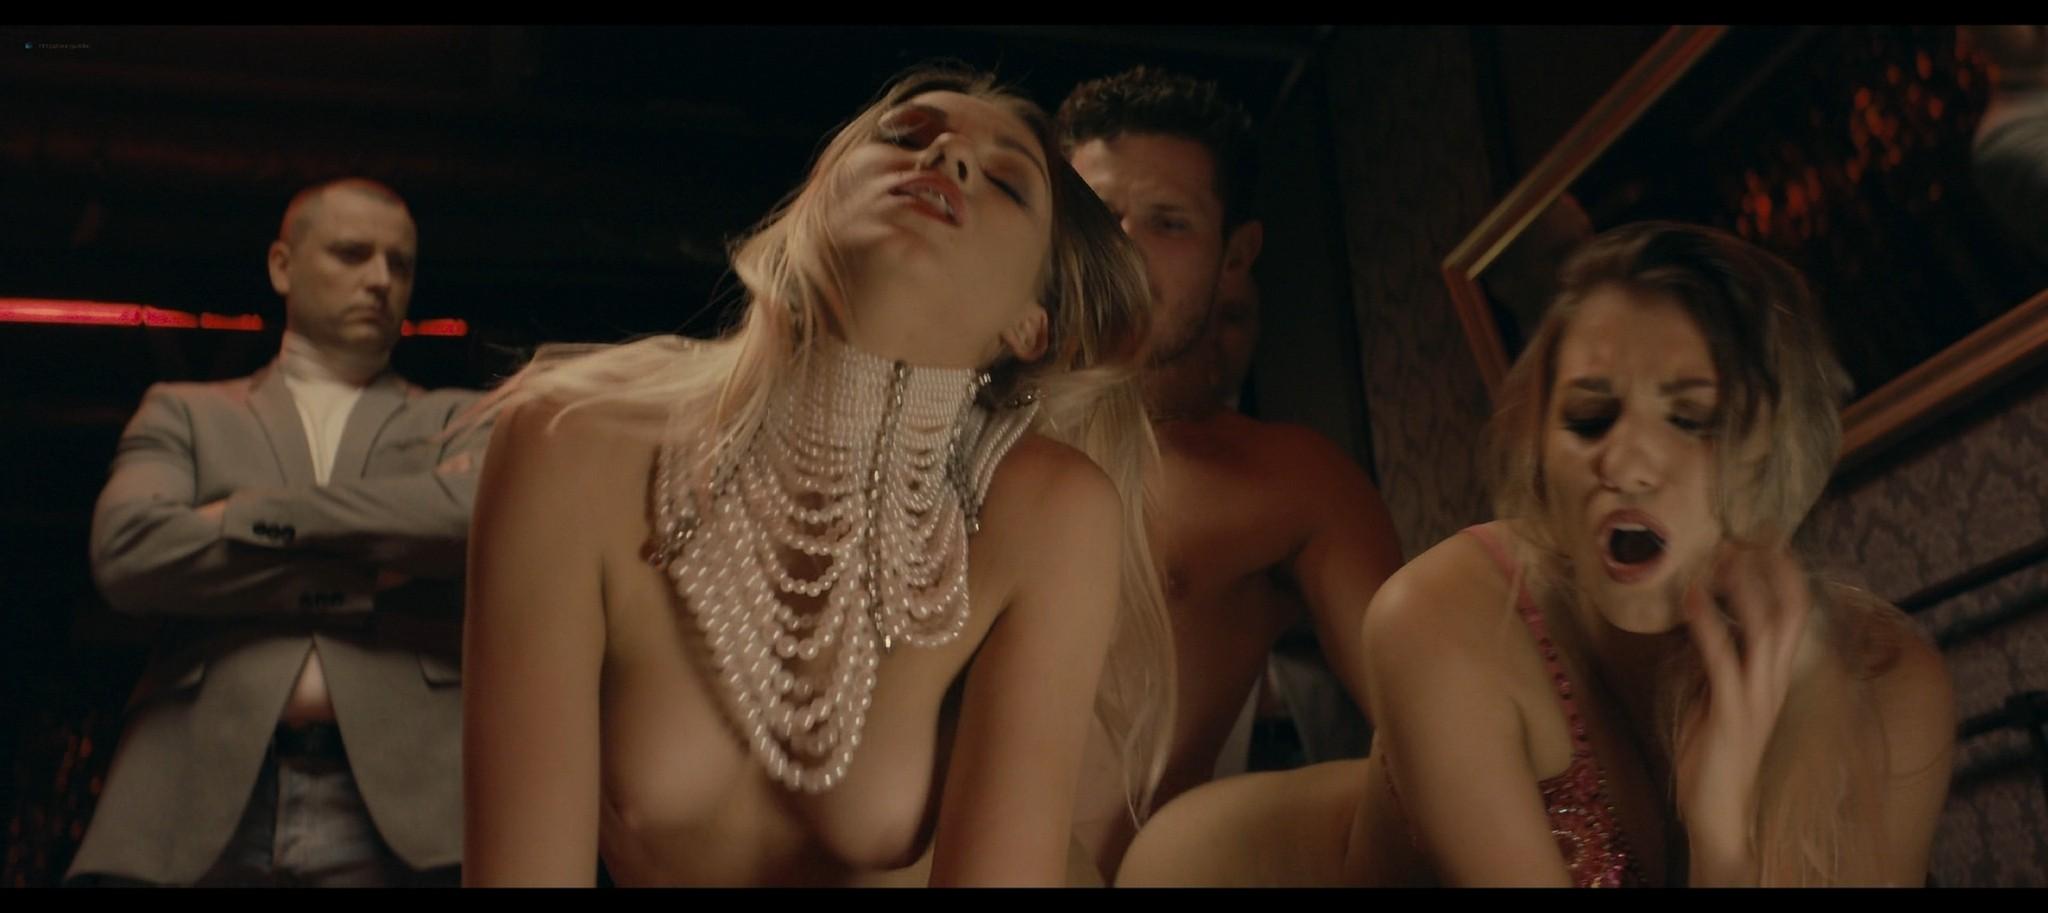 Katarzyna Warnke sex Aleksandra Nowicka Karolina Dziuba nude Petla PL 2020 1080 BluRay 07